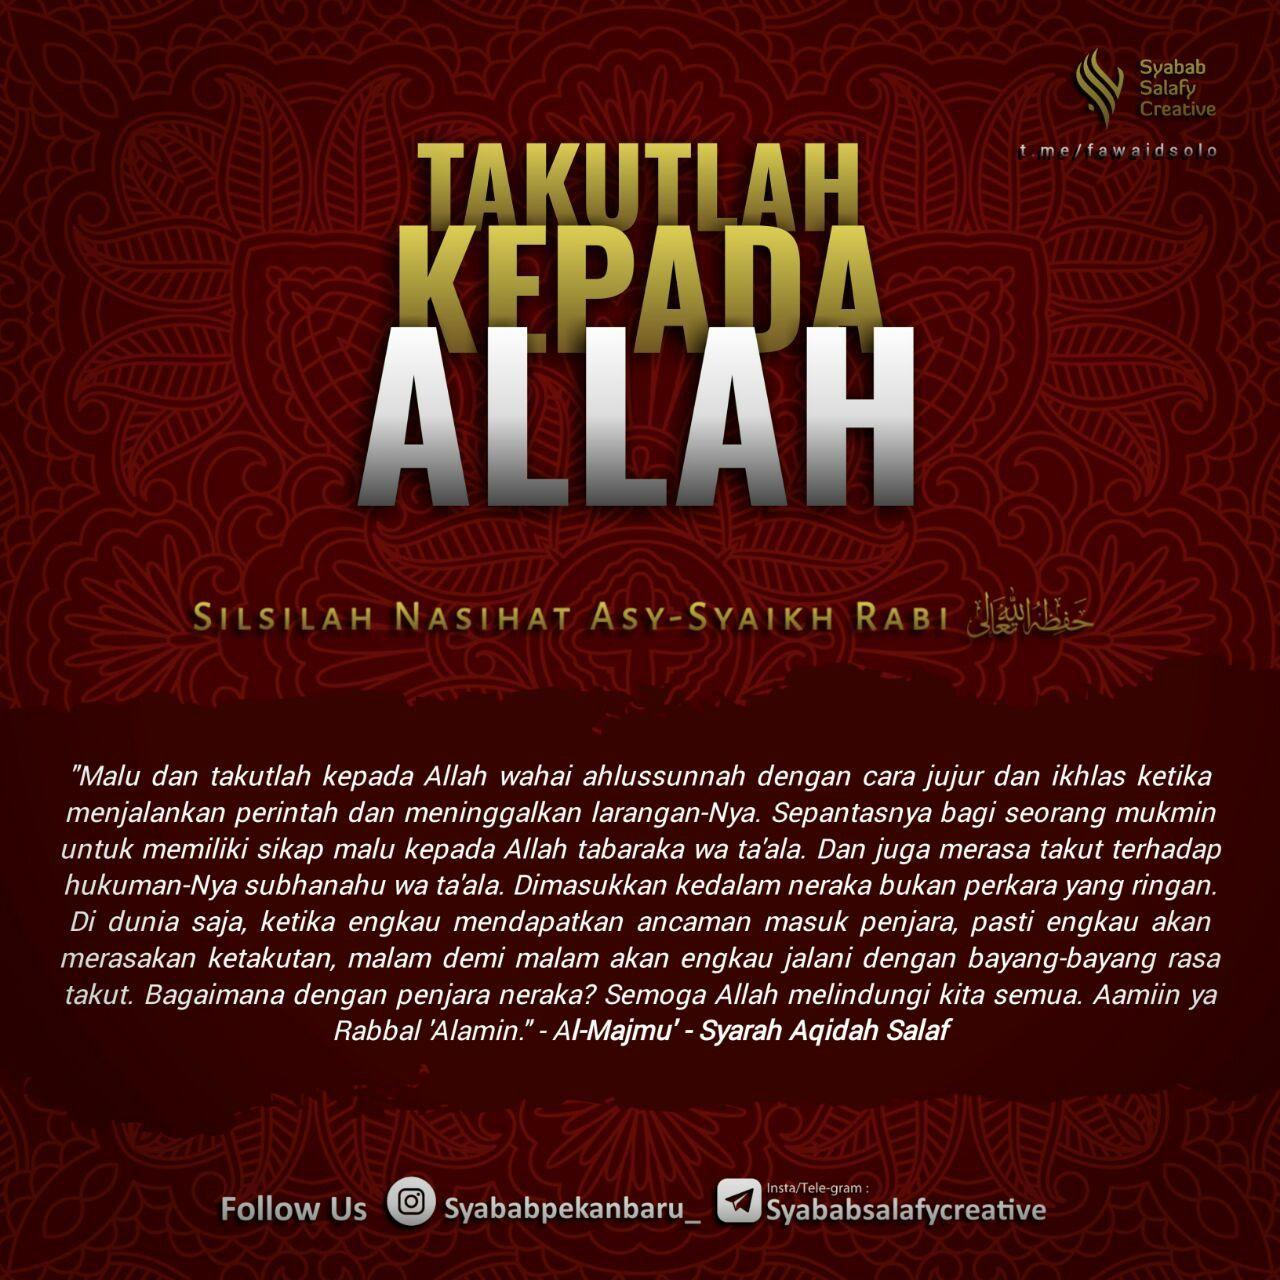 Pin oleh Seimma Nurul Prahikmahtin di Quran, Hadits, & Advices